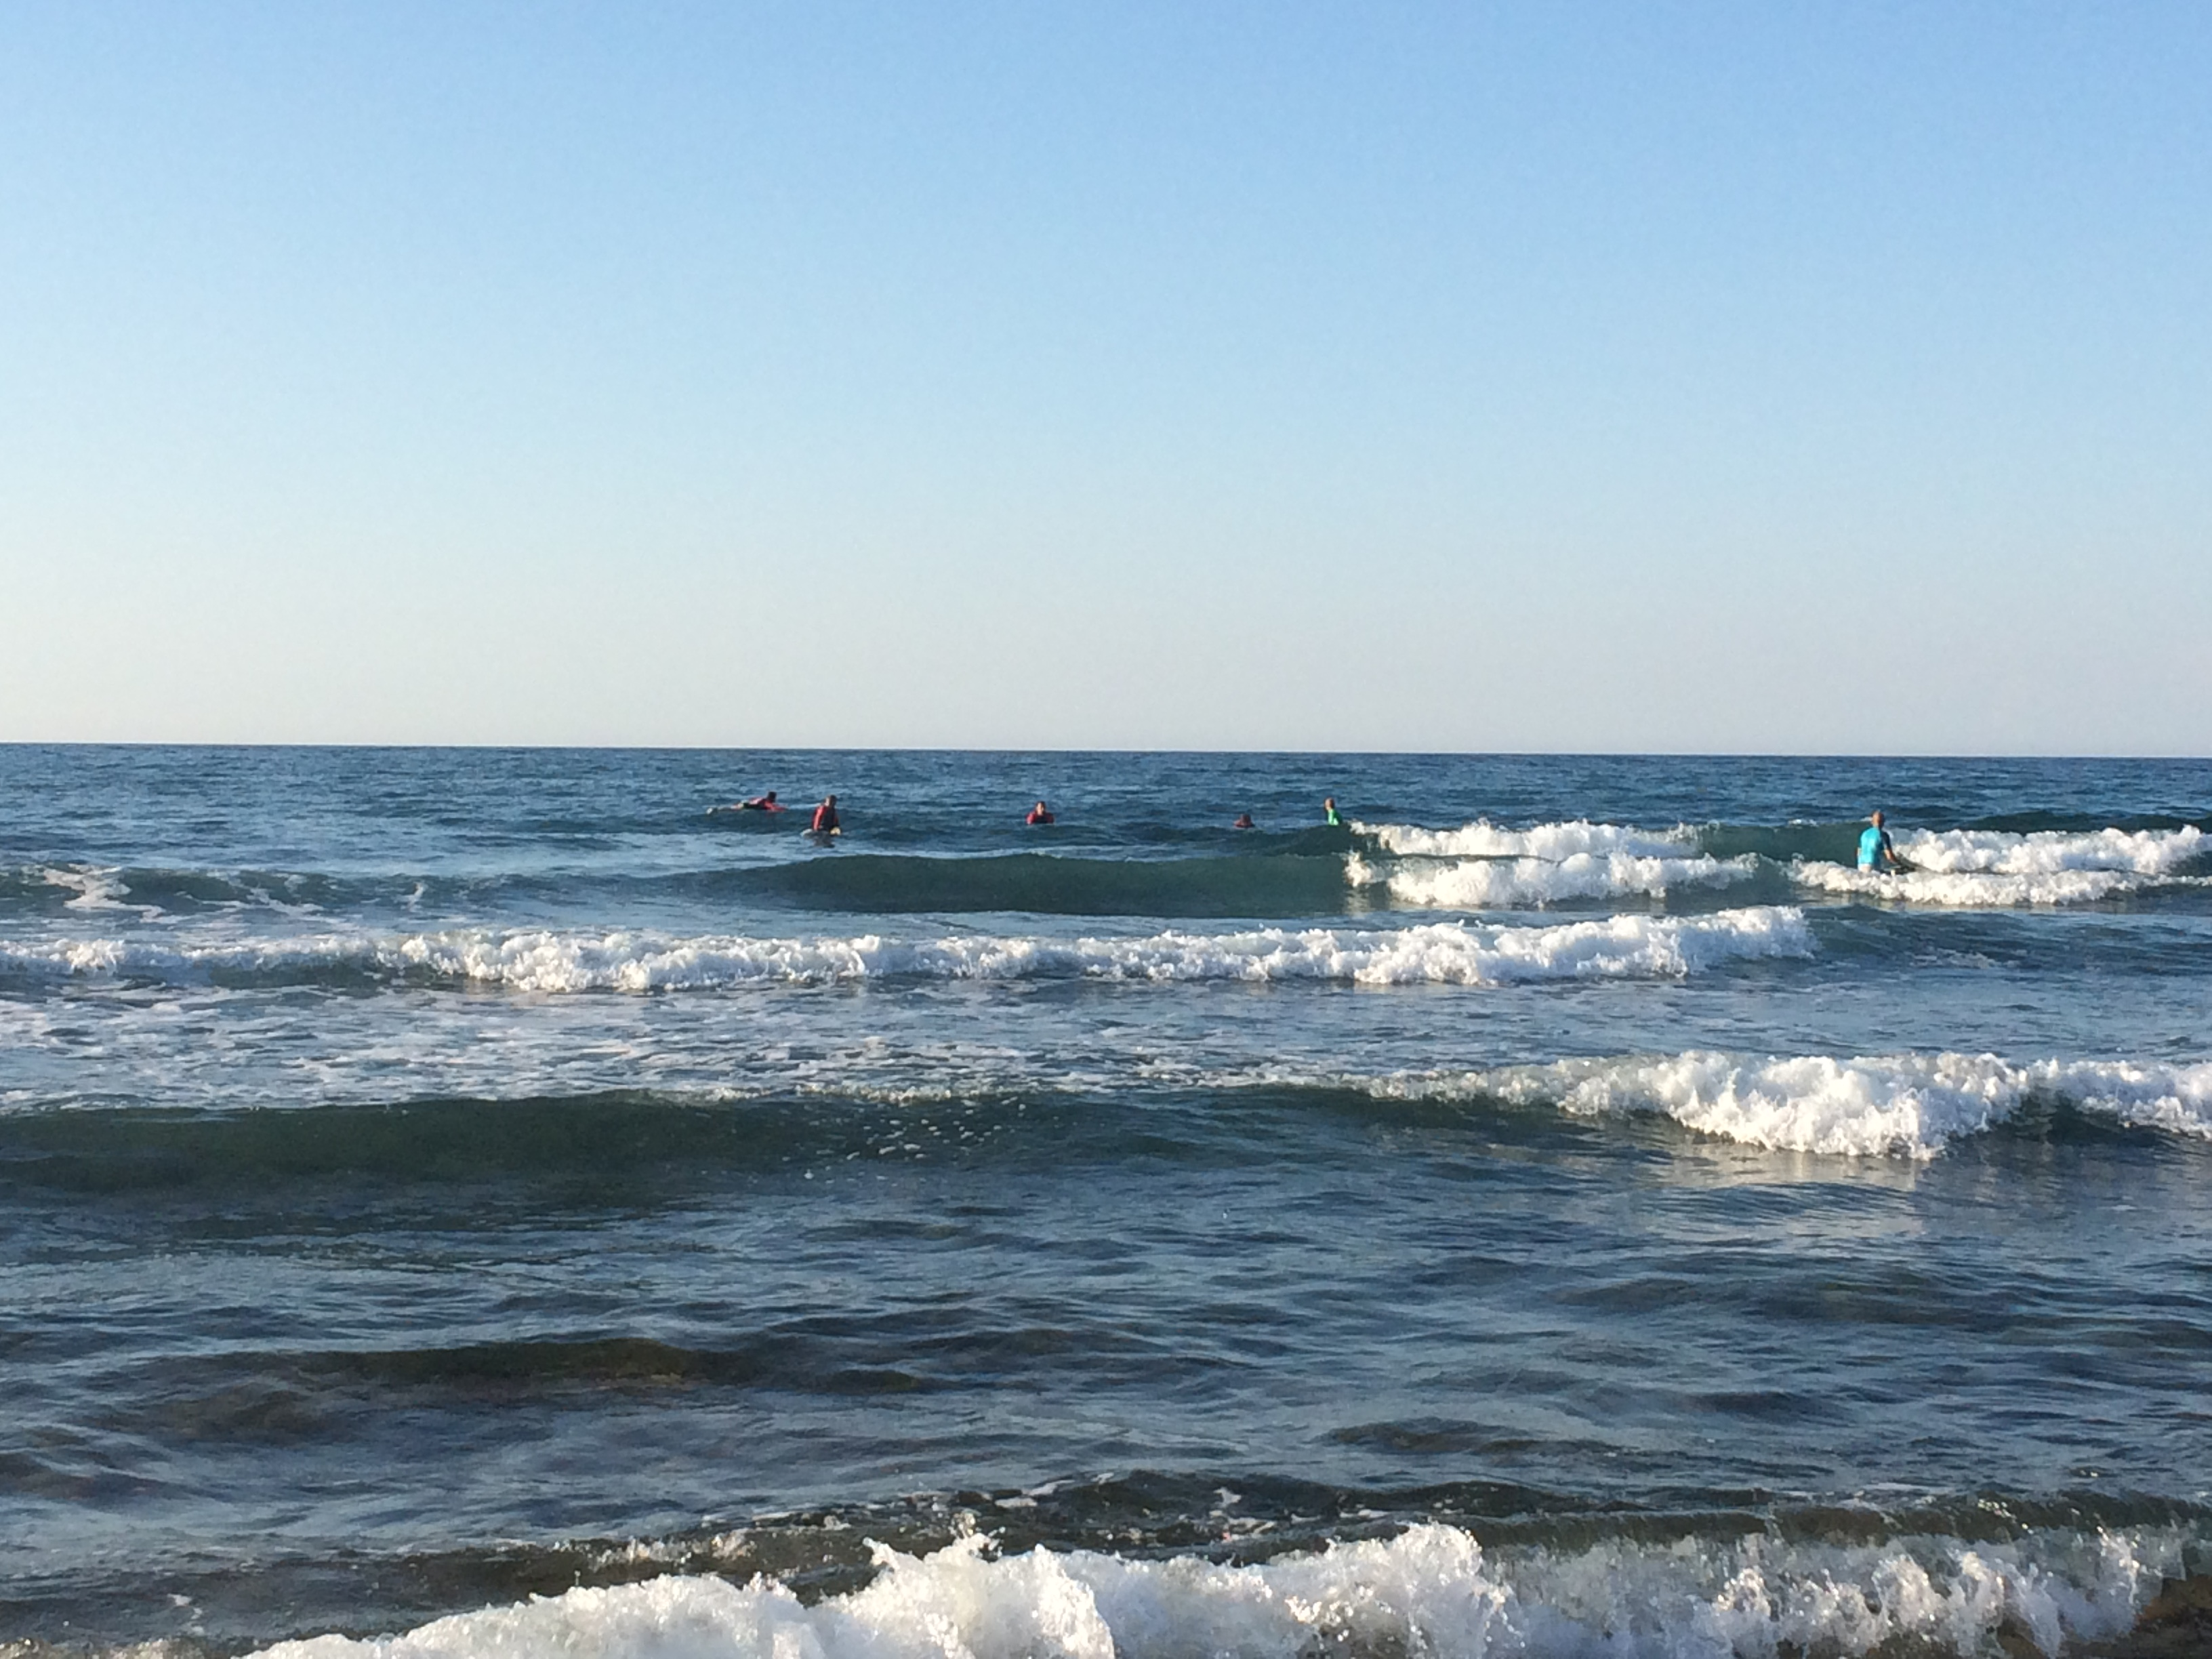 Surfing shool bari, puglia